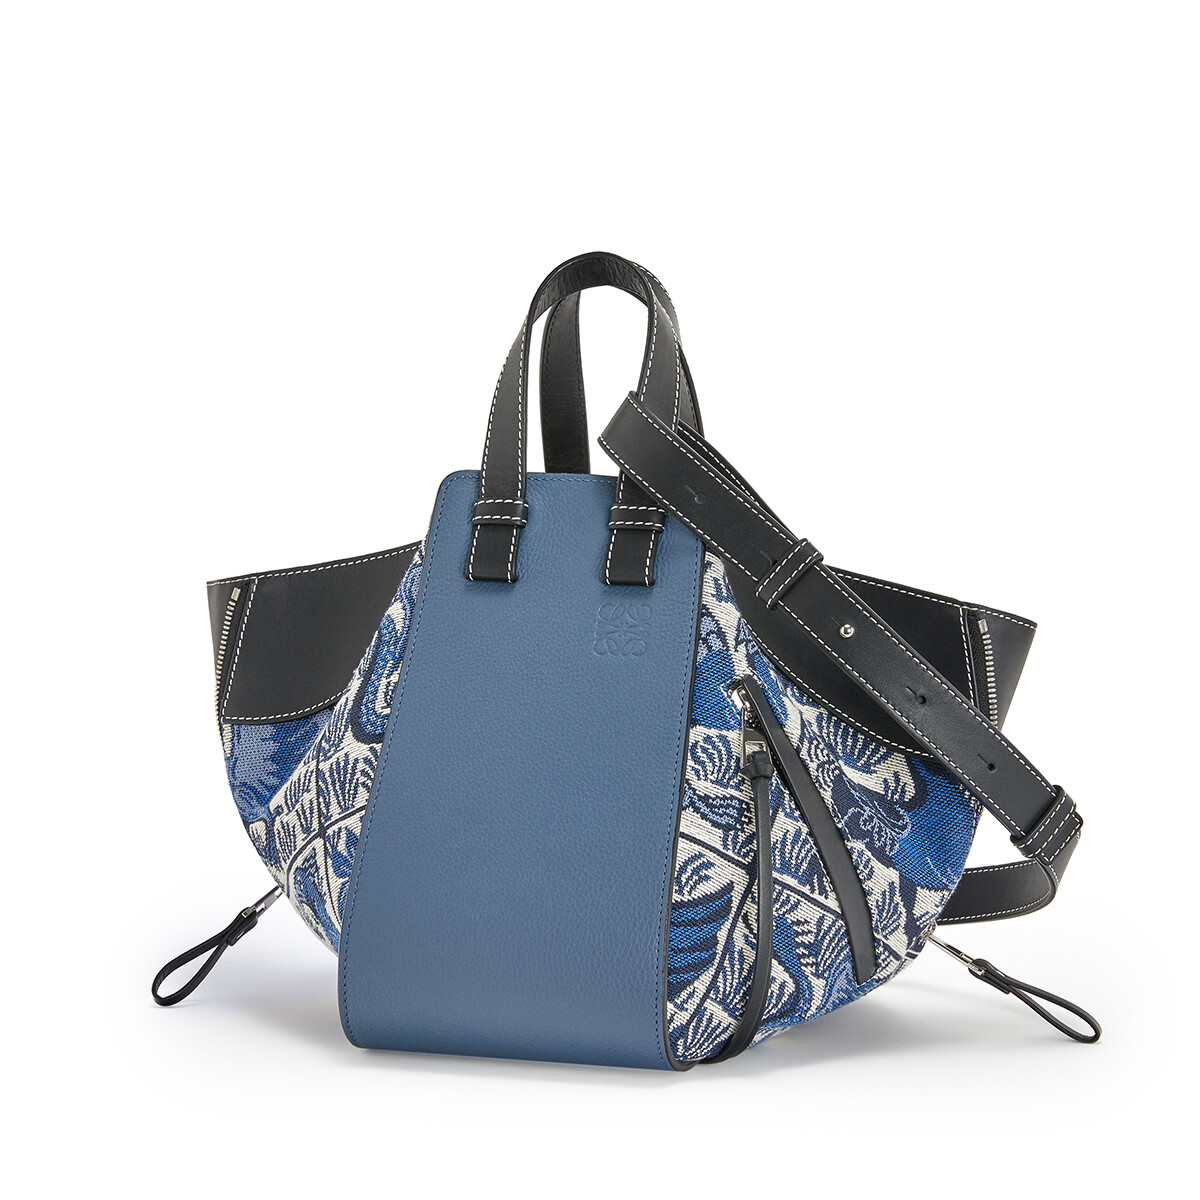 LOEWE Hammock Tiles Small Bag 蓝色 front